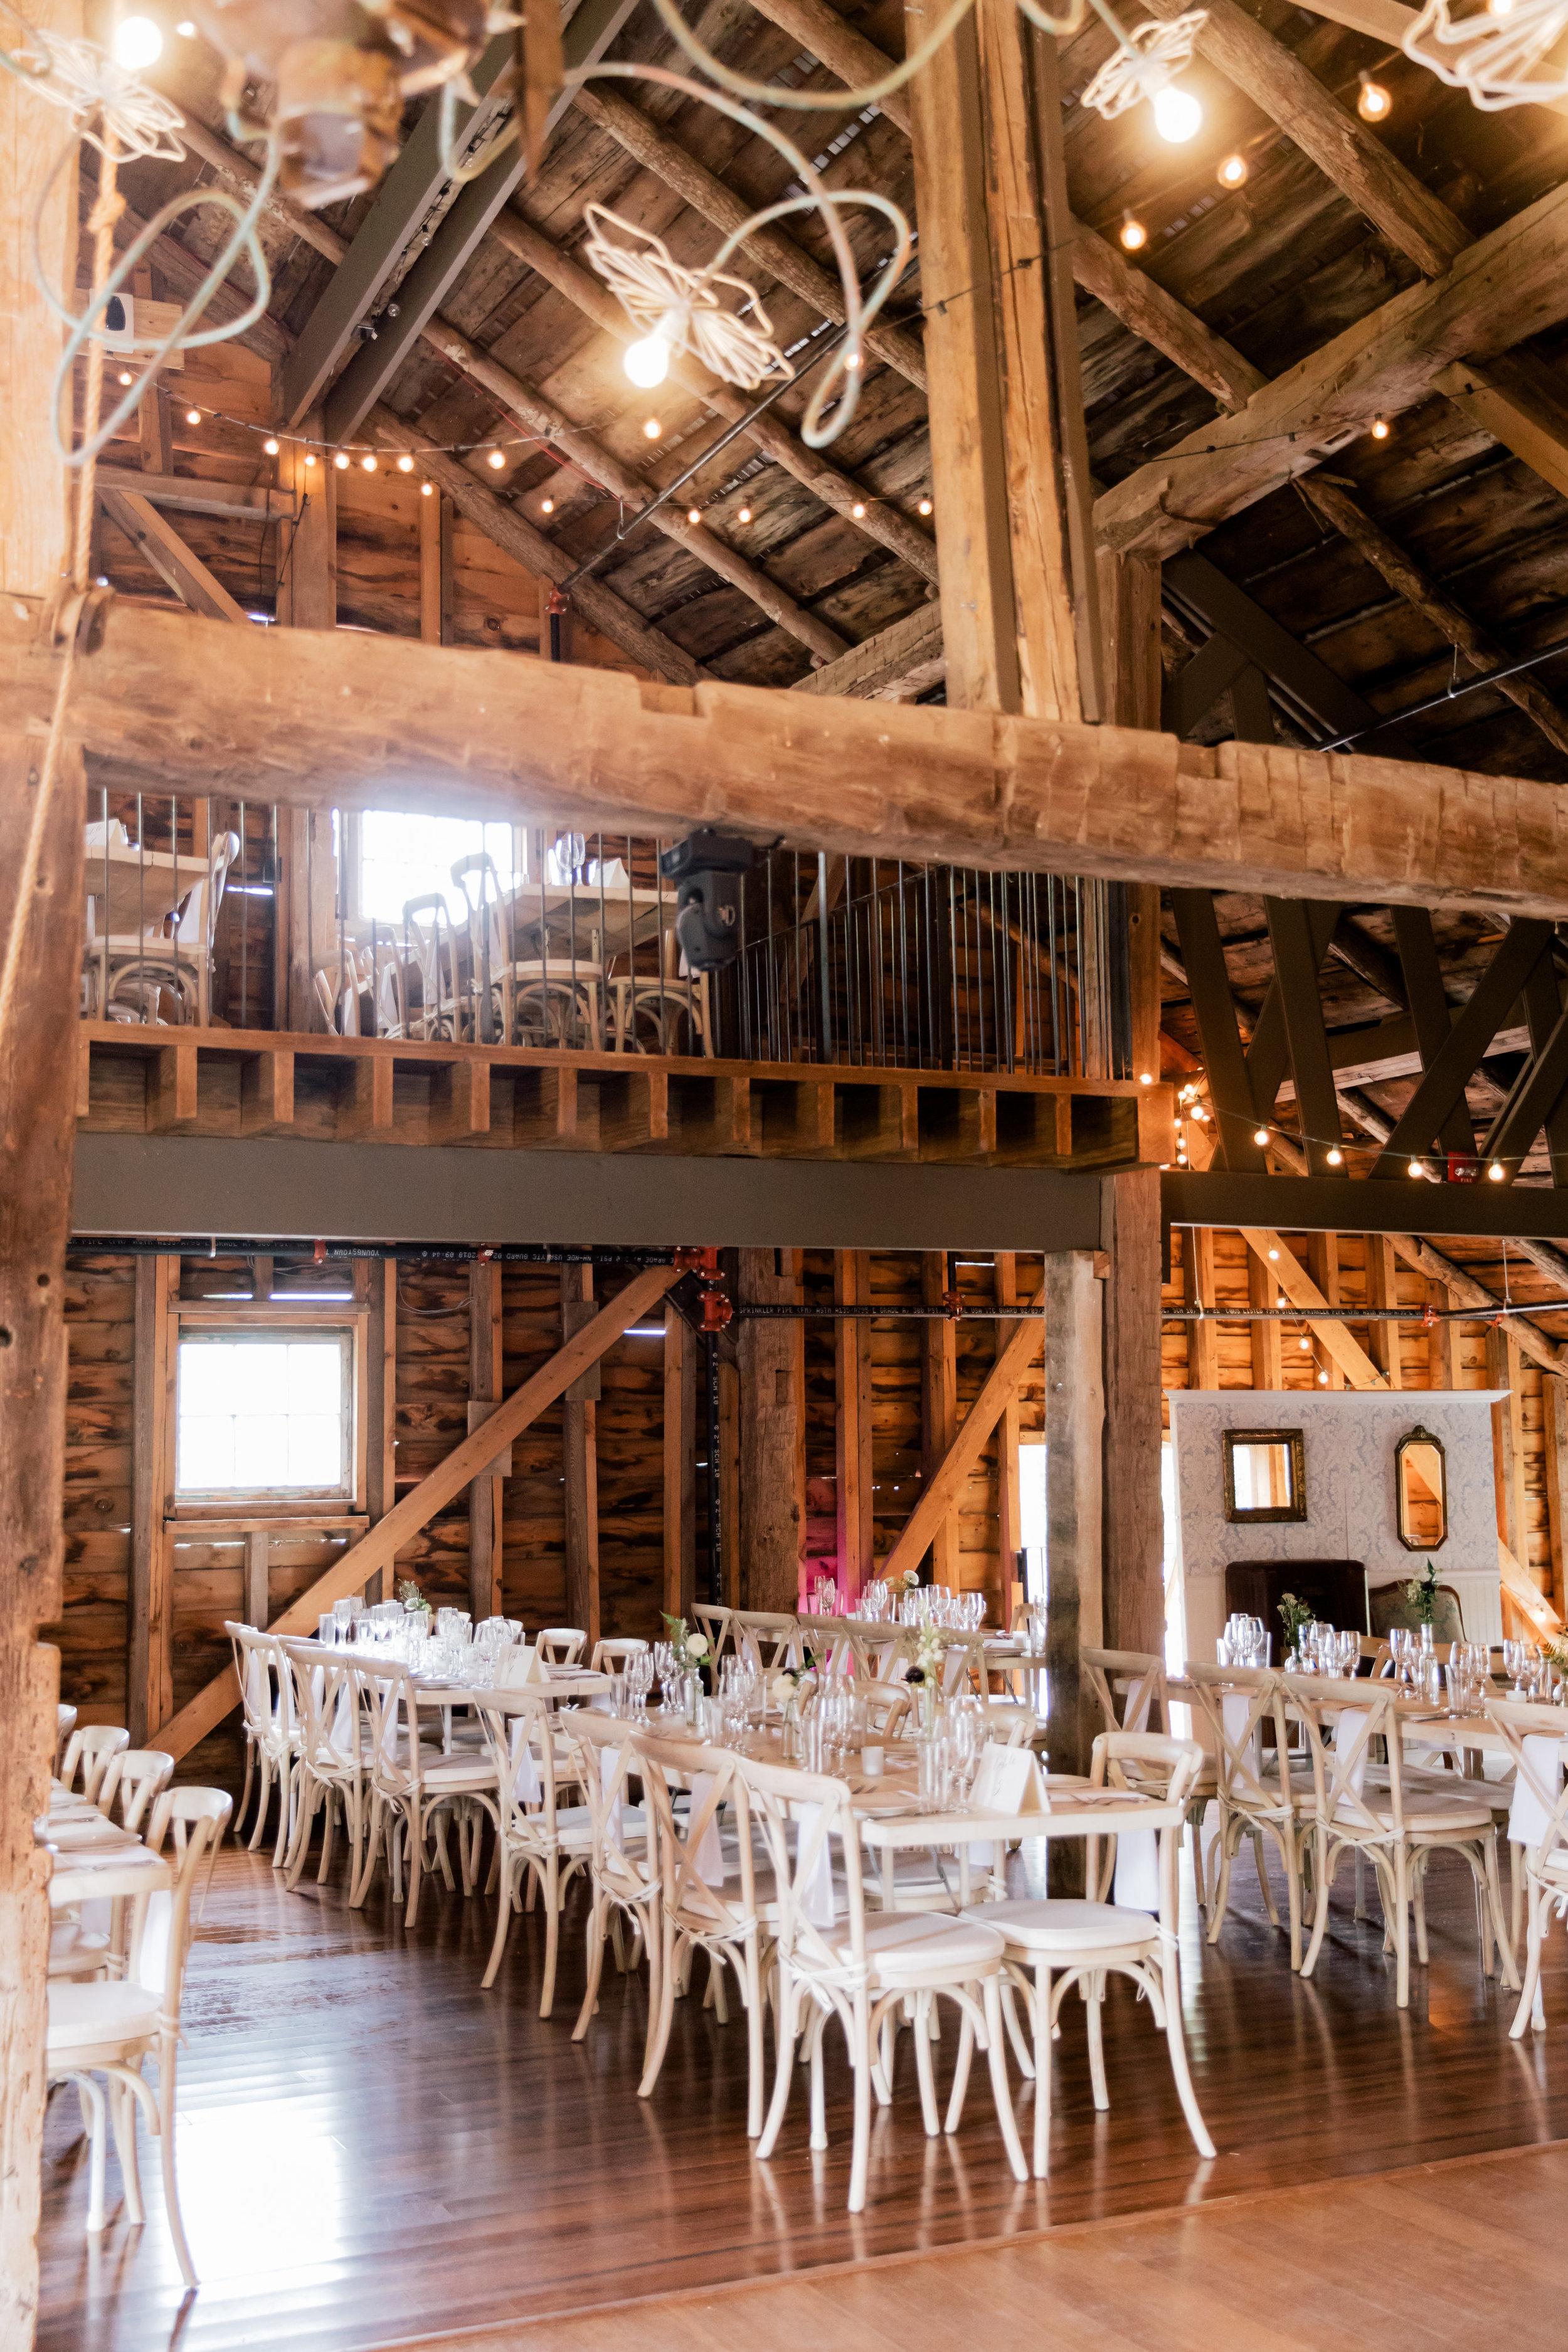 Ben Elise Wedding-Reception Details-0003.jpg